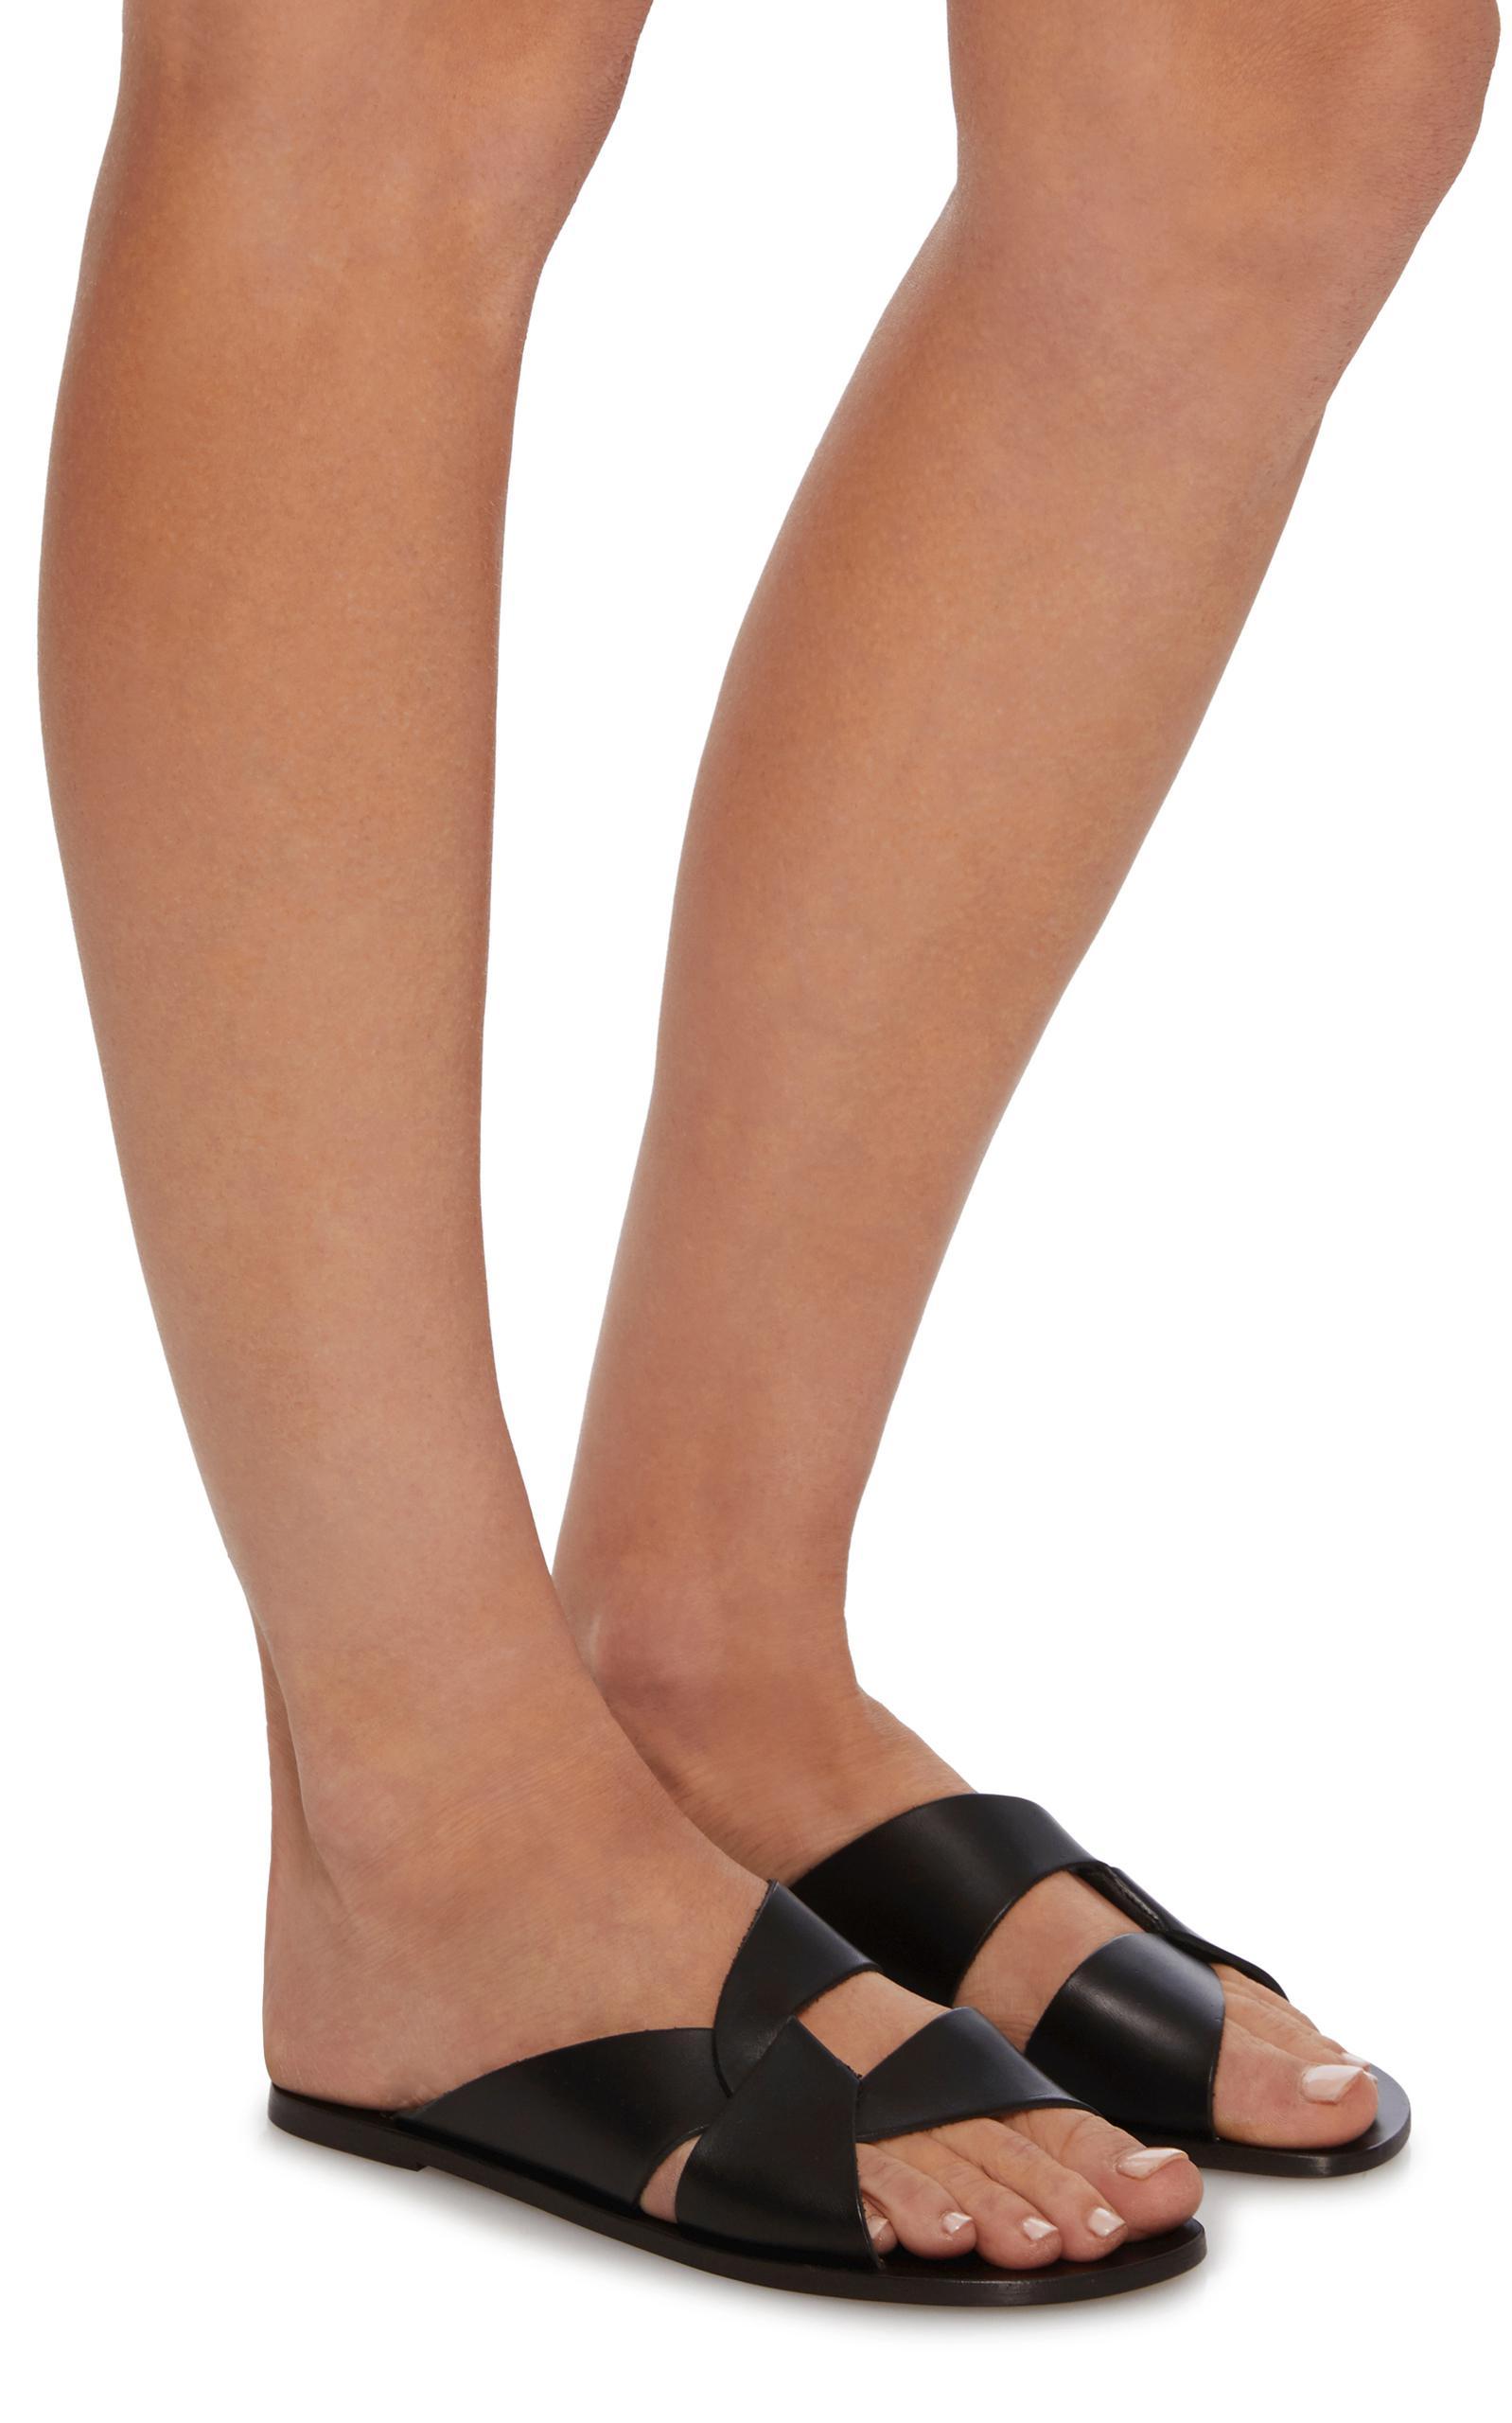 Cheap Big Sale Cheap Sale 2018 Unisex Astrid Leather Sandals - Black ATP Atelier Buy Cheap Real ZQNj0Y1